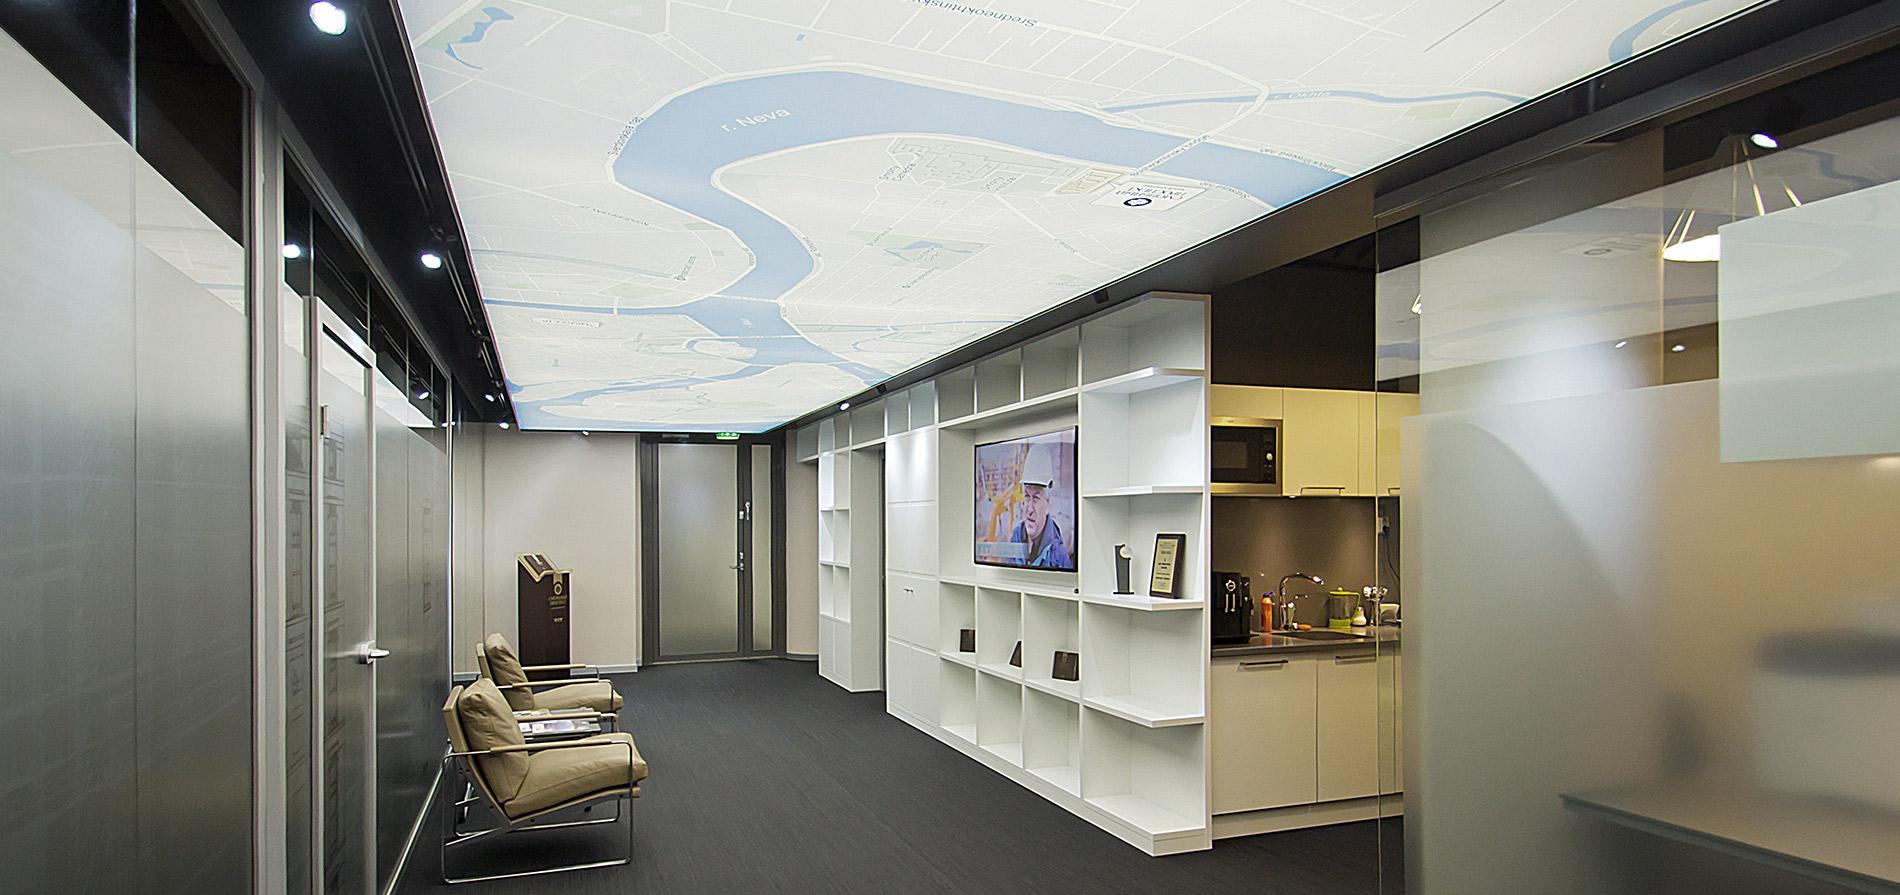 Art-ceilings fromthemanufacturer